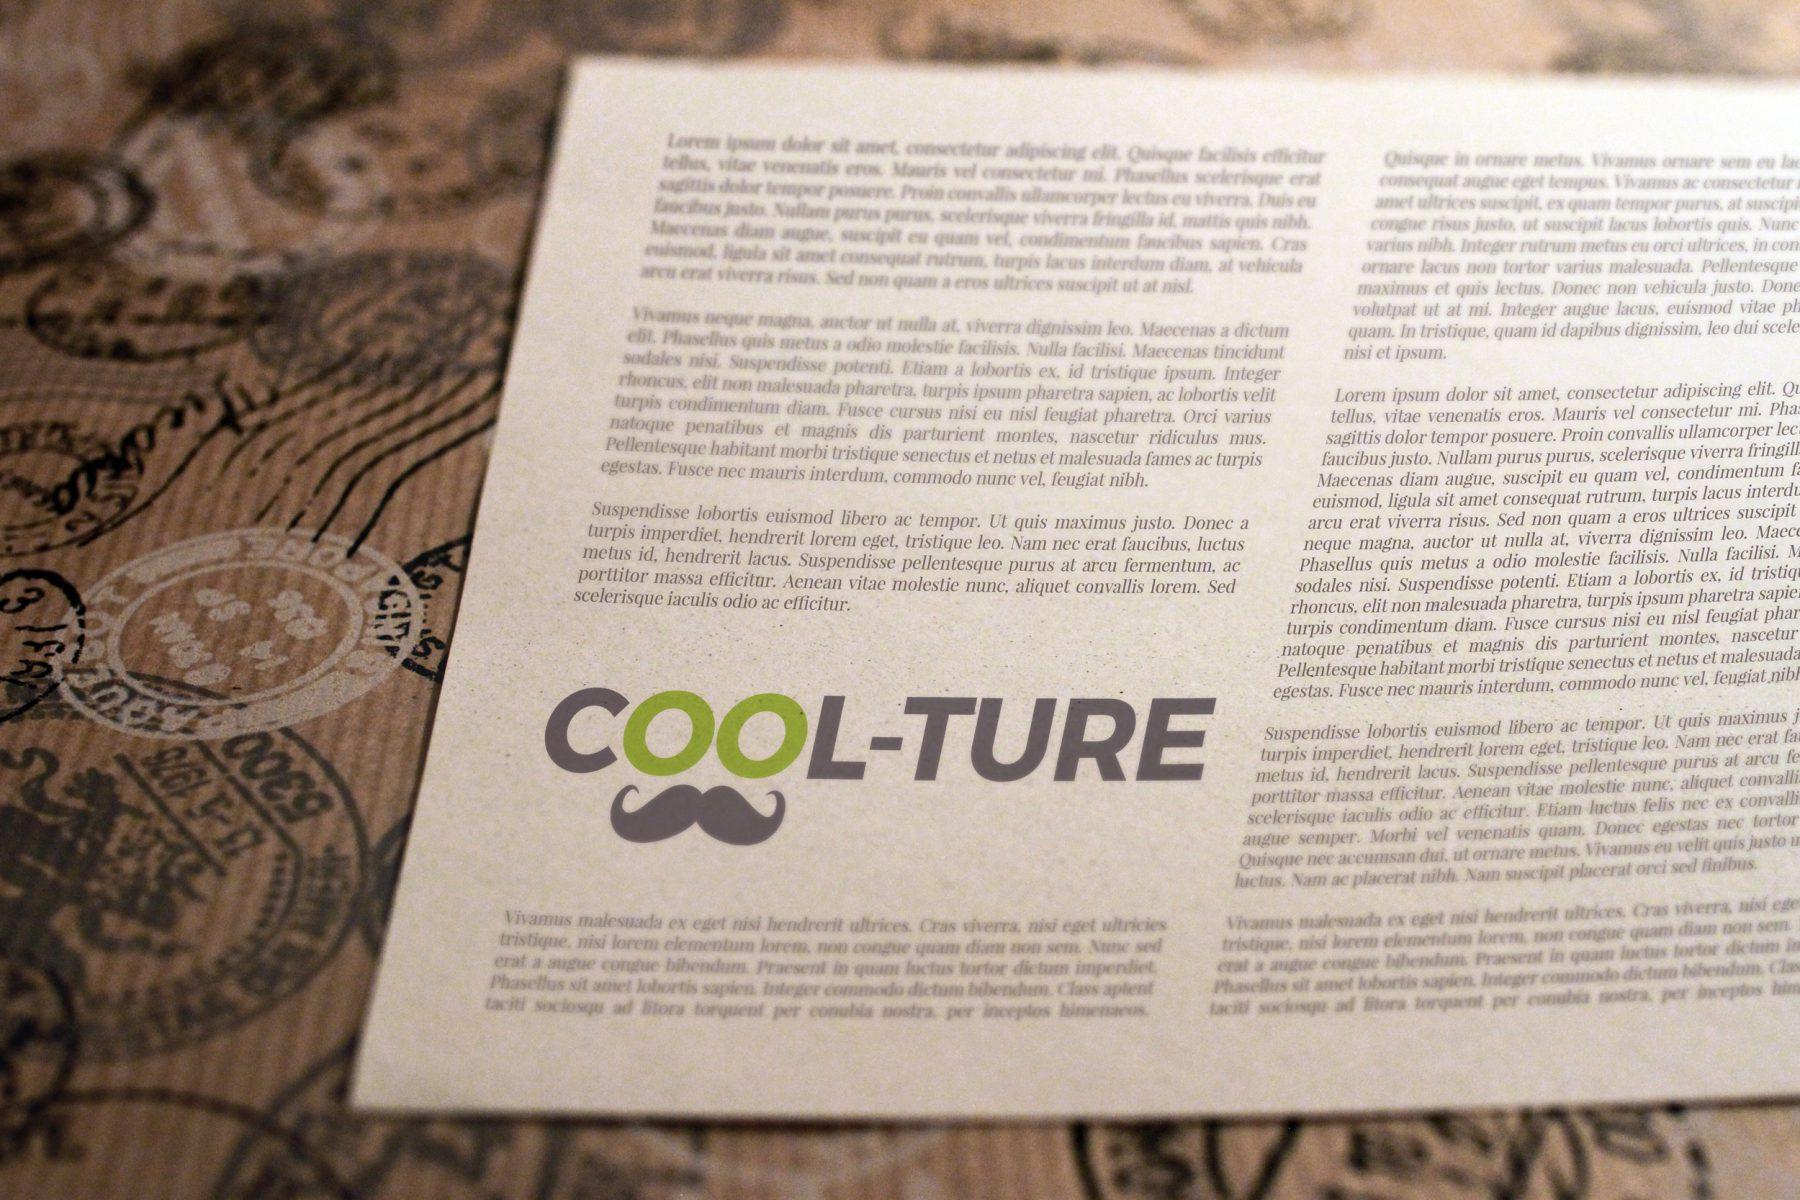 Kilmulis design - Cool-ture - logo 02